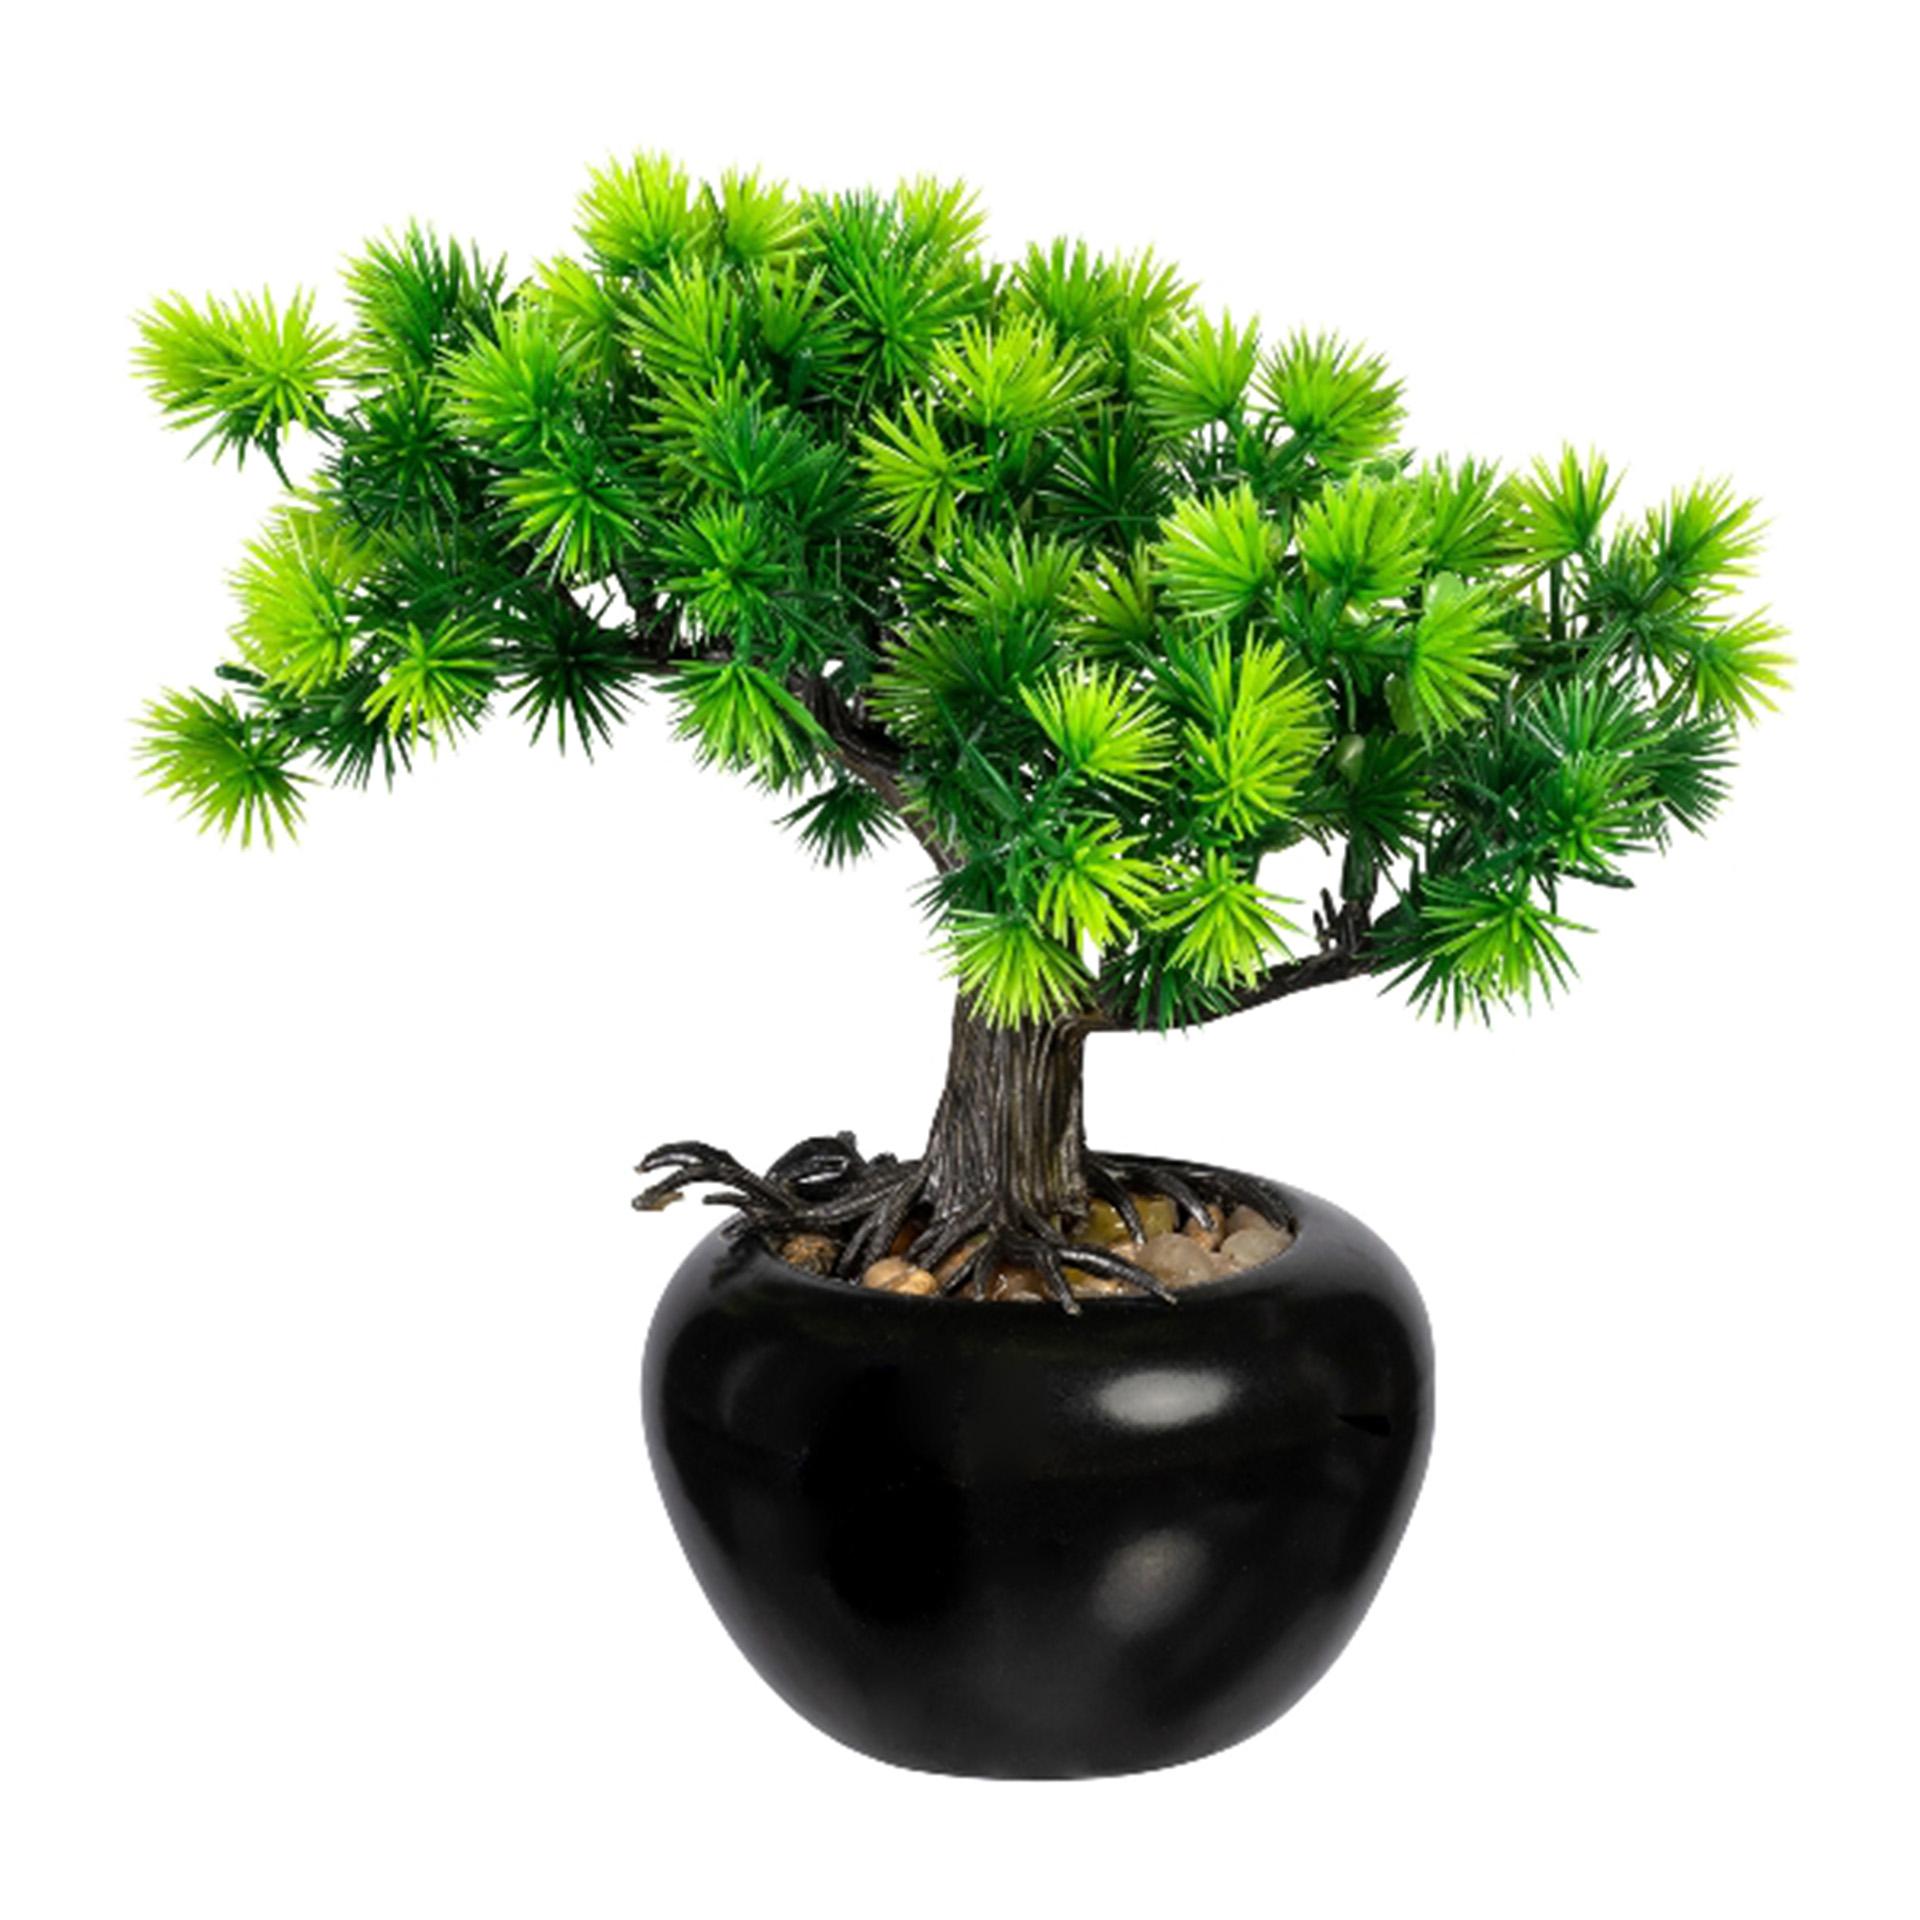 Kunstpflanze Bonsai Lärche 19cm